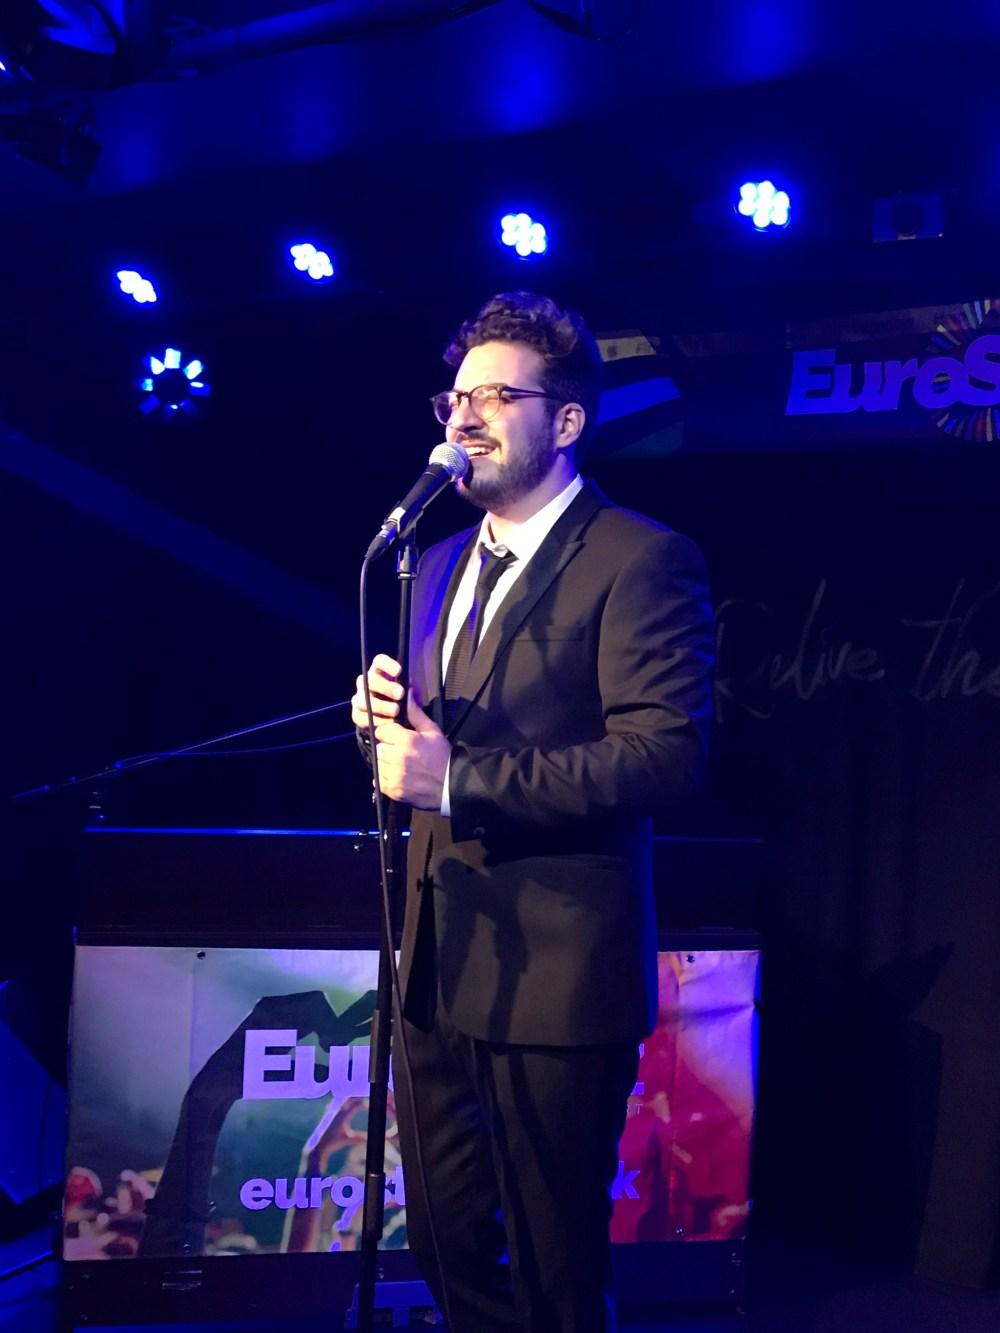 John Karayiannis at EuroStarz in Concert 2018